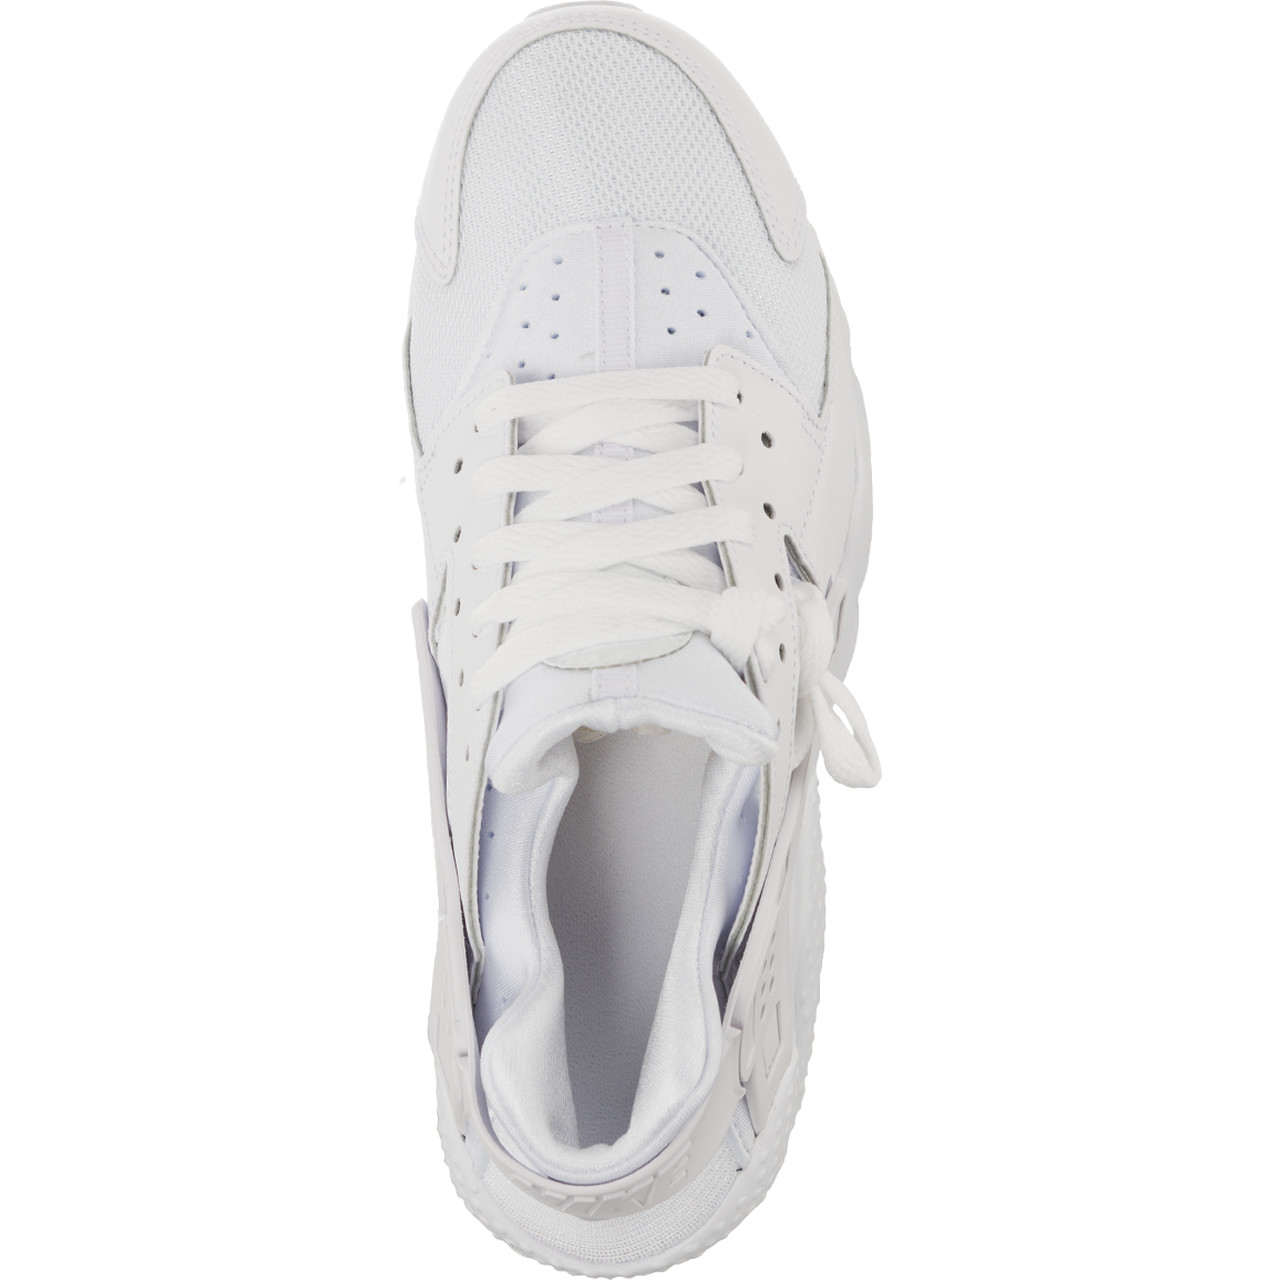 100% authentic a90b6 8742b ... RUN GS 110 small Buty Nike brsmallHUARACHE ...